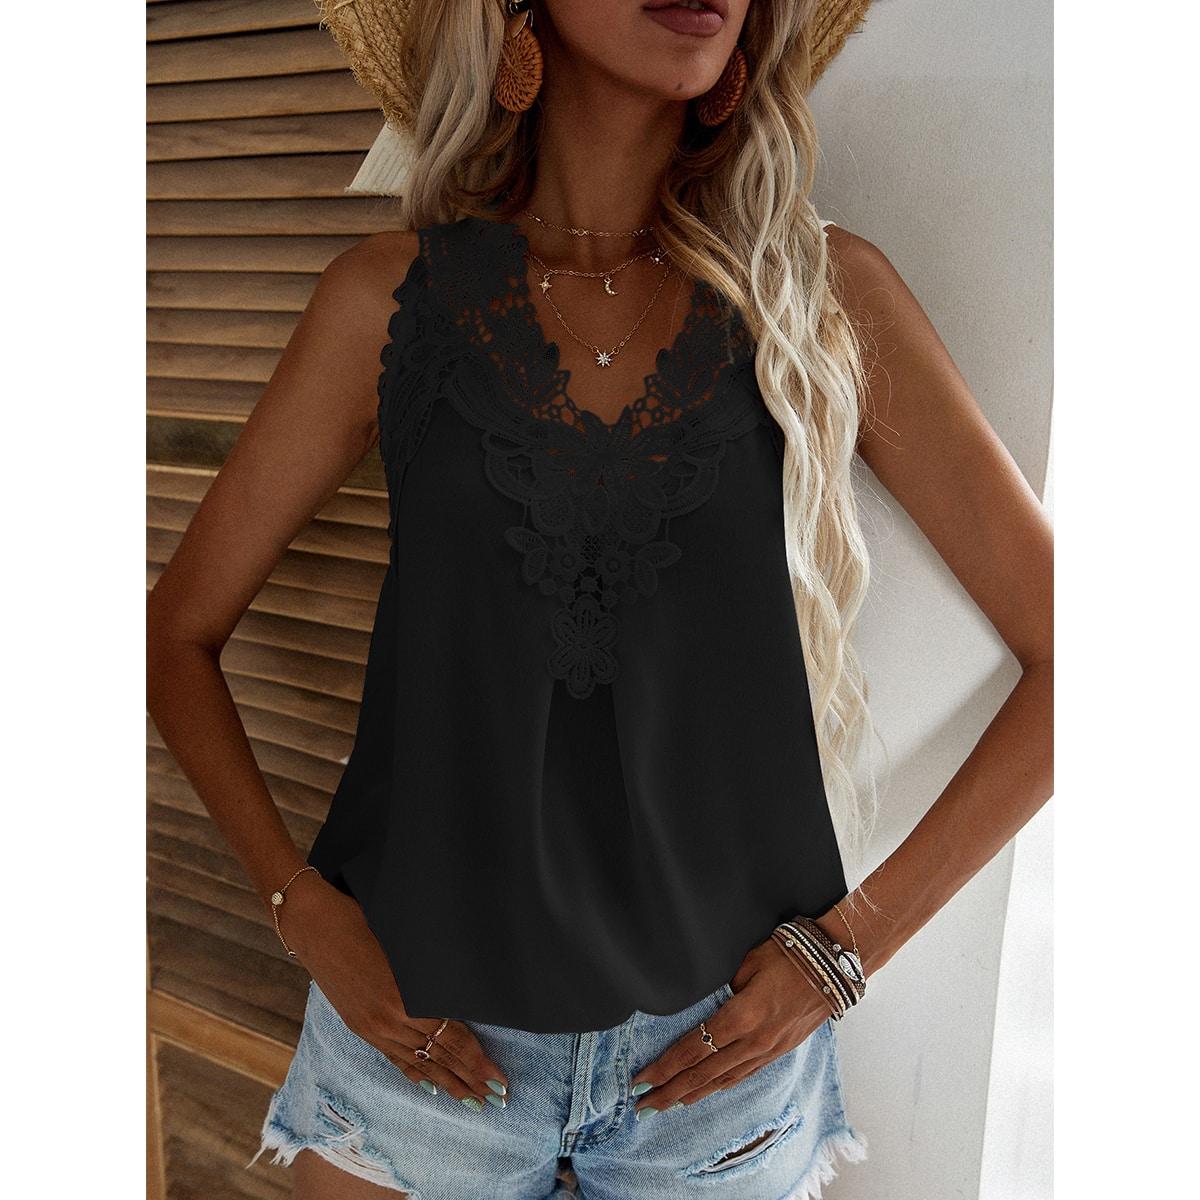 Однотонная блуза с кружевом SheIn swblouse23210519574